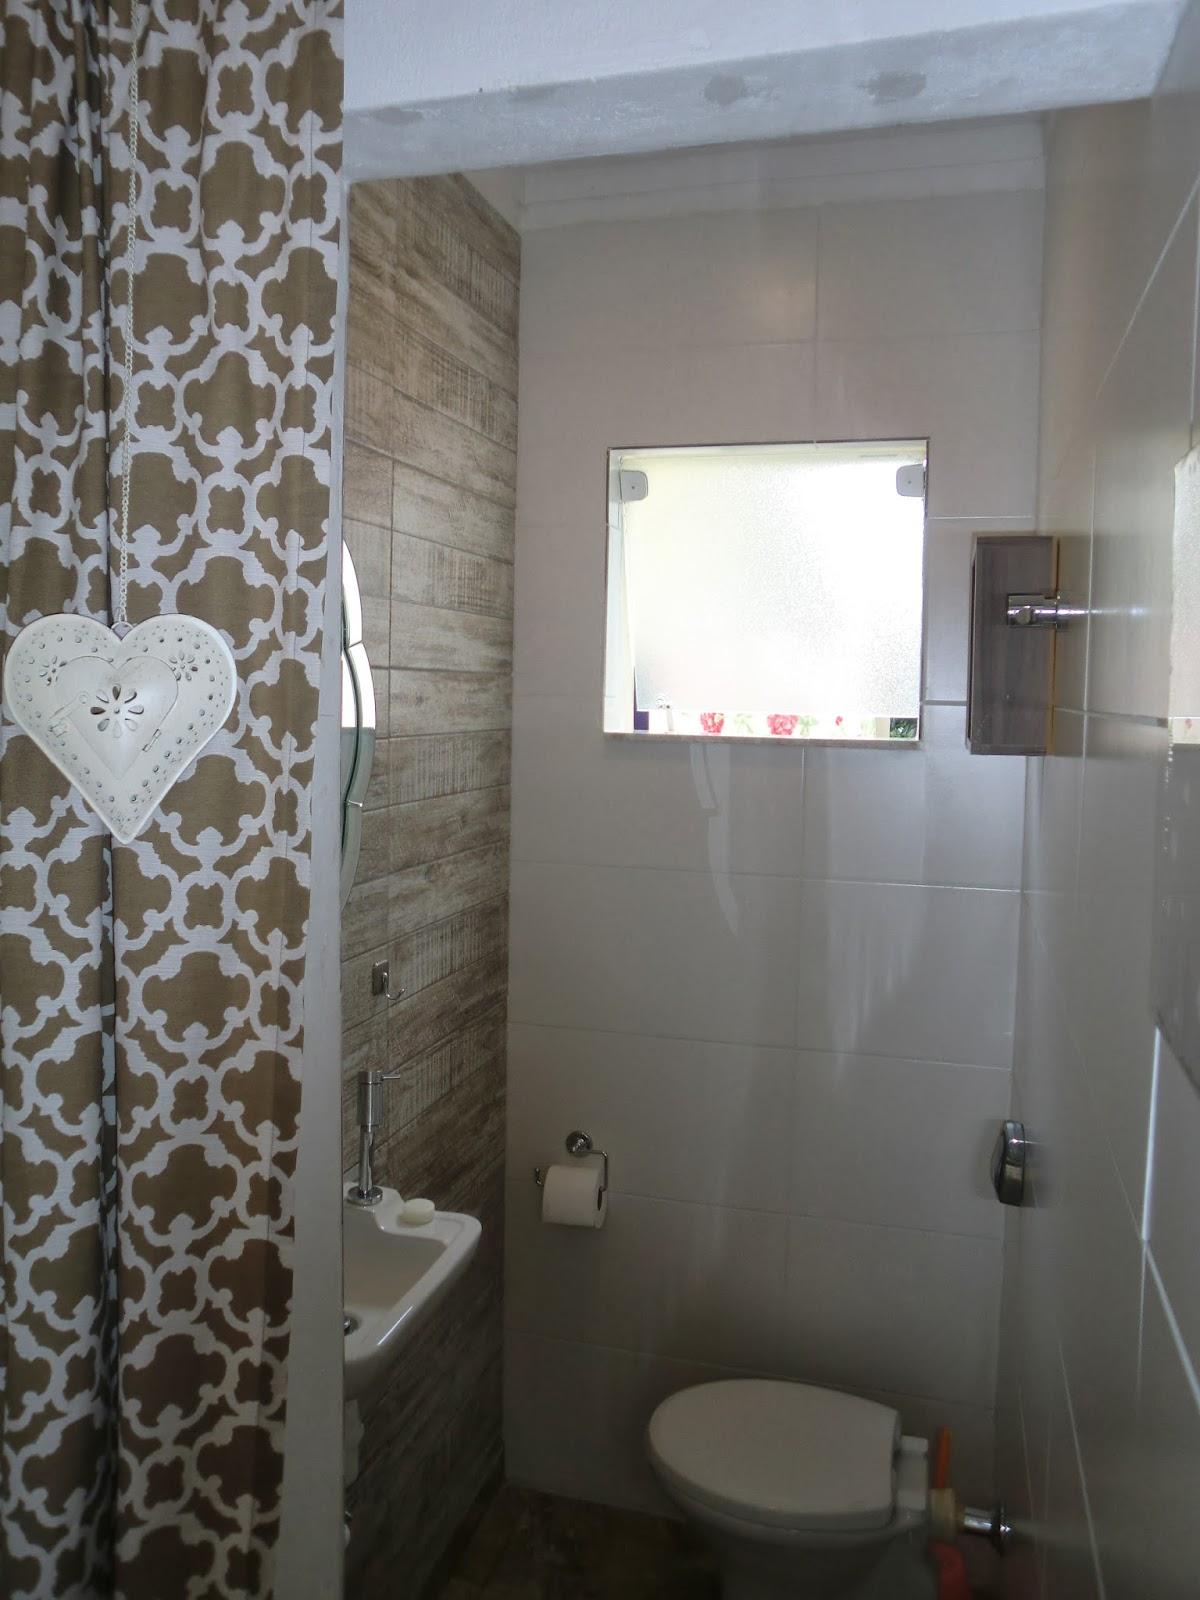 Mini Lavabo Depois da Reforma Antes e Depois Reforma de Banheiro  #566275 1200x1600 Banheiro Antes E Depois Da Reforma